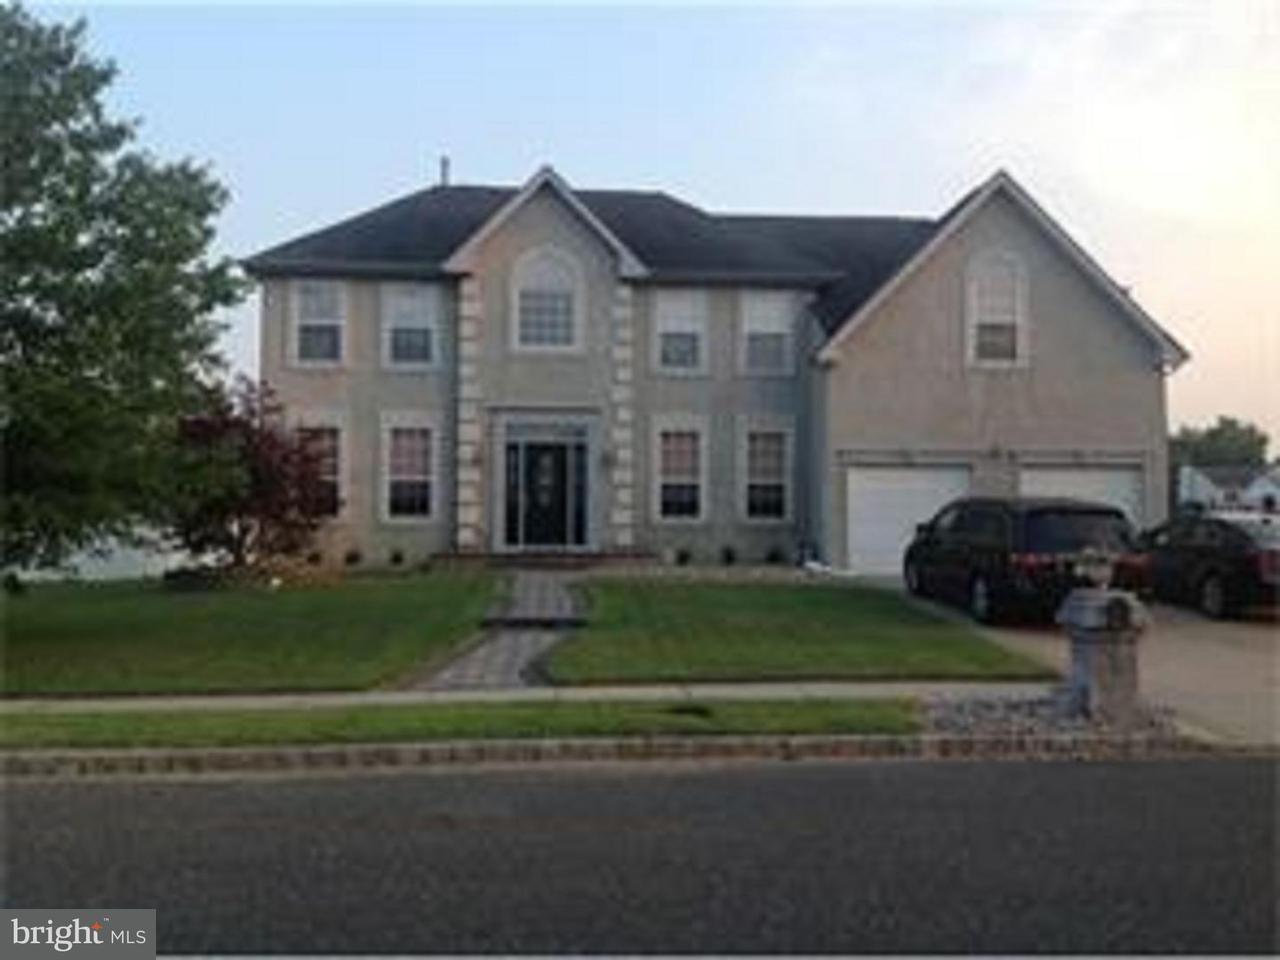 Casa Unifamiliar por un Alquiler en 1322 BAVARIAN WAY Monroe Township, Nueva Jersey 08094 Estados UnidosEn/Alrededor: Monroe Township